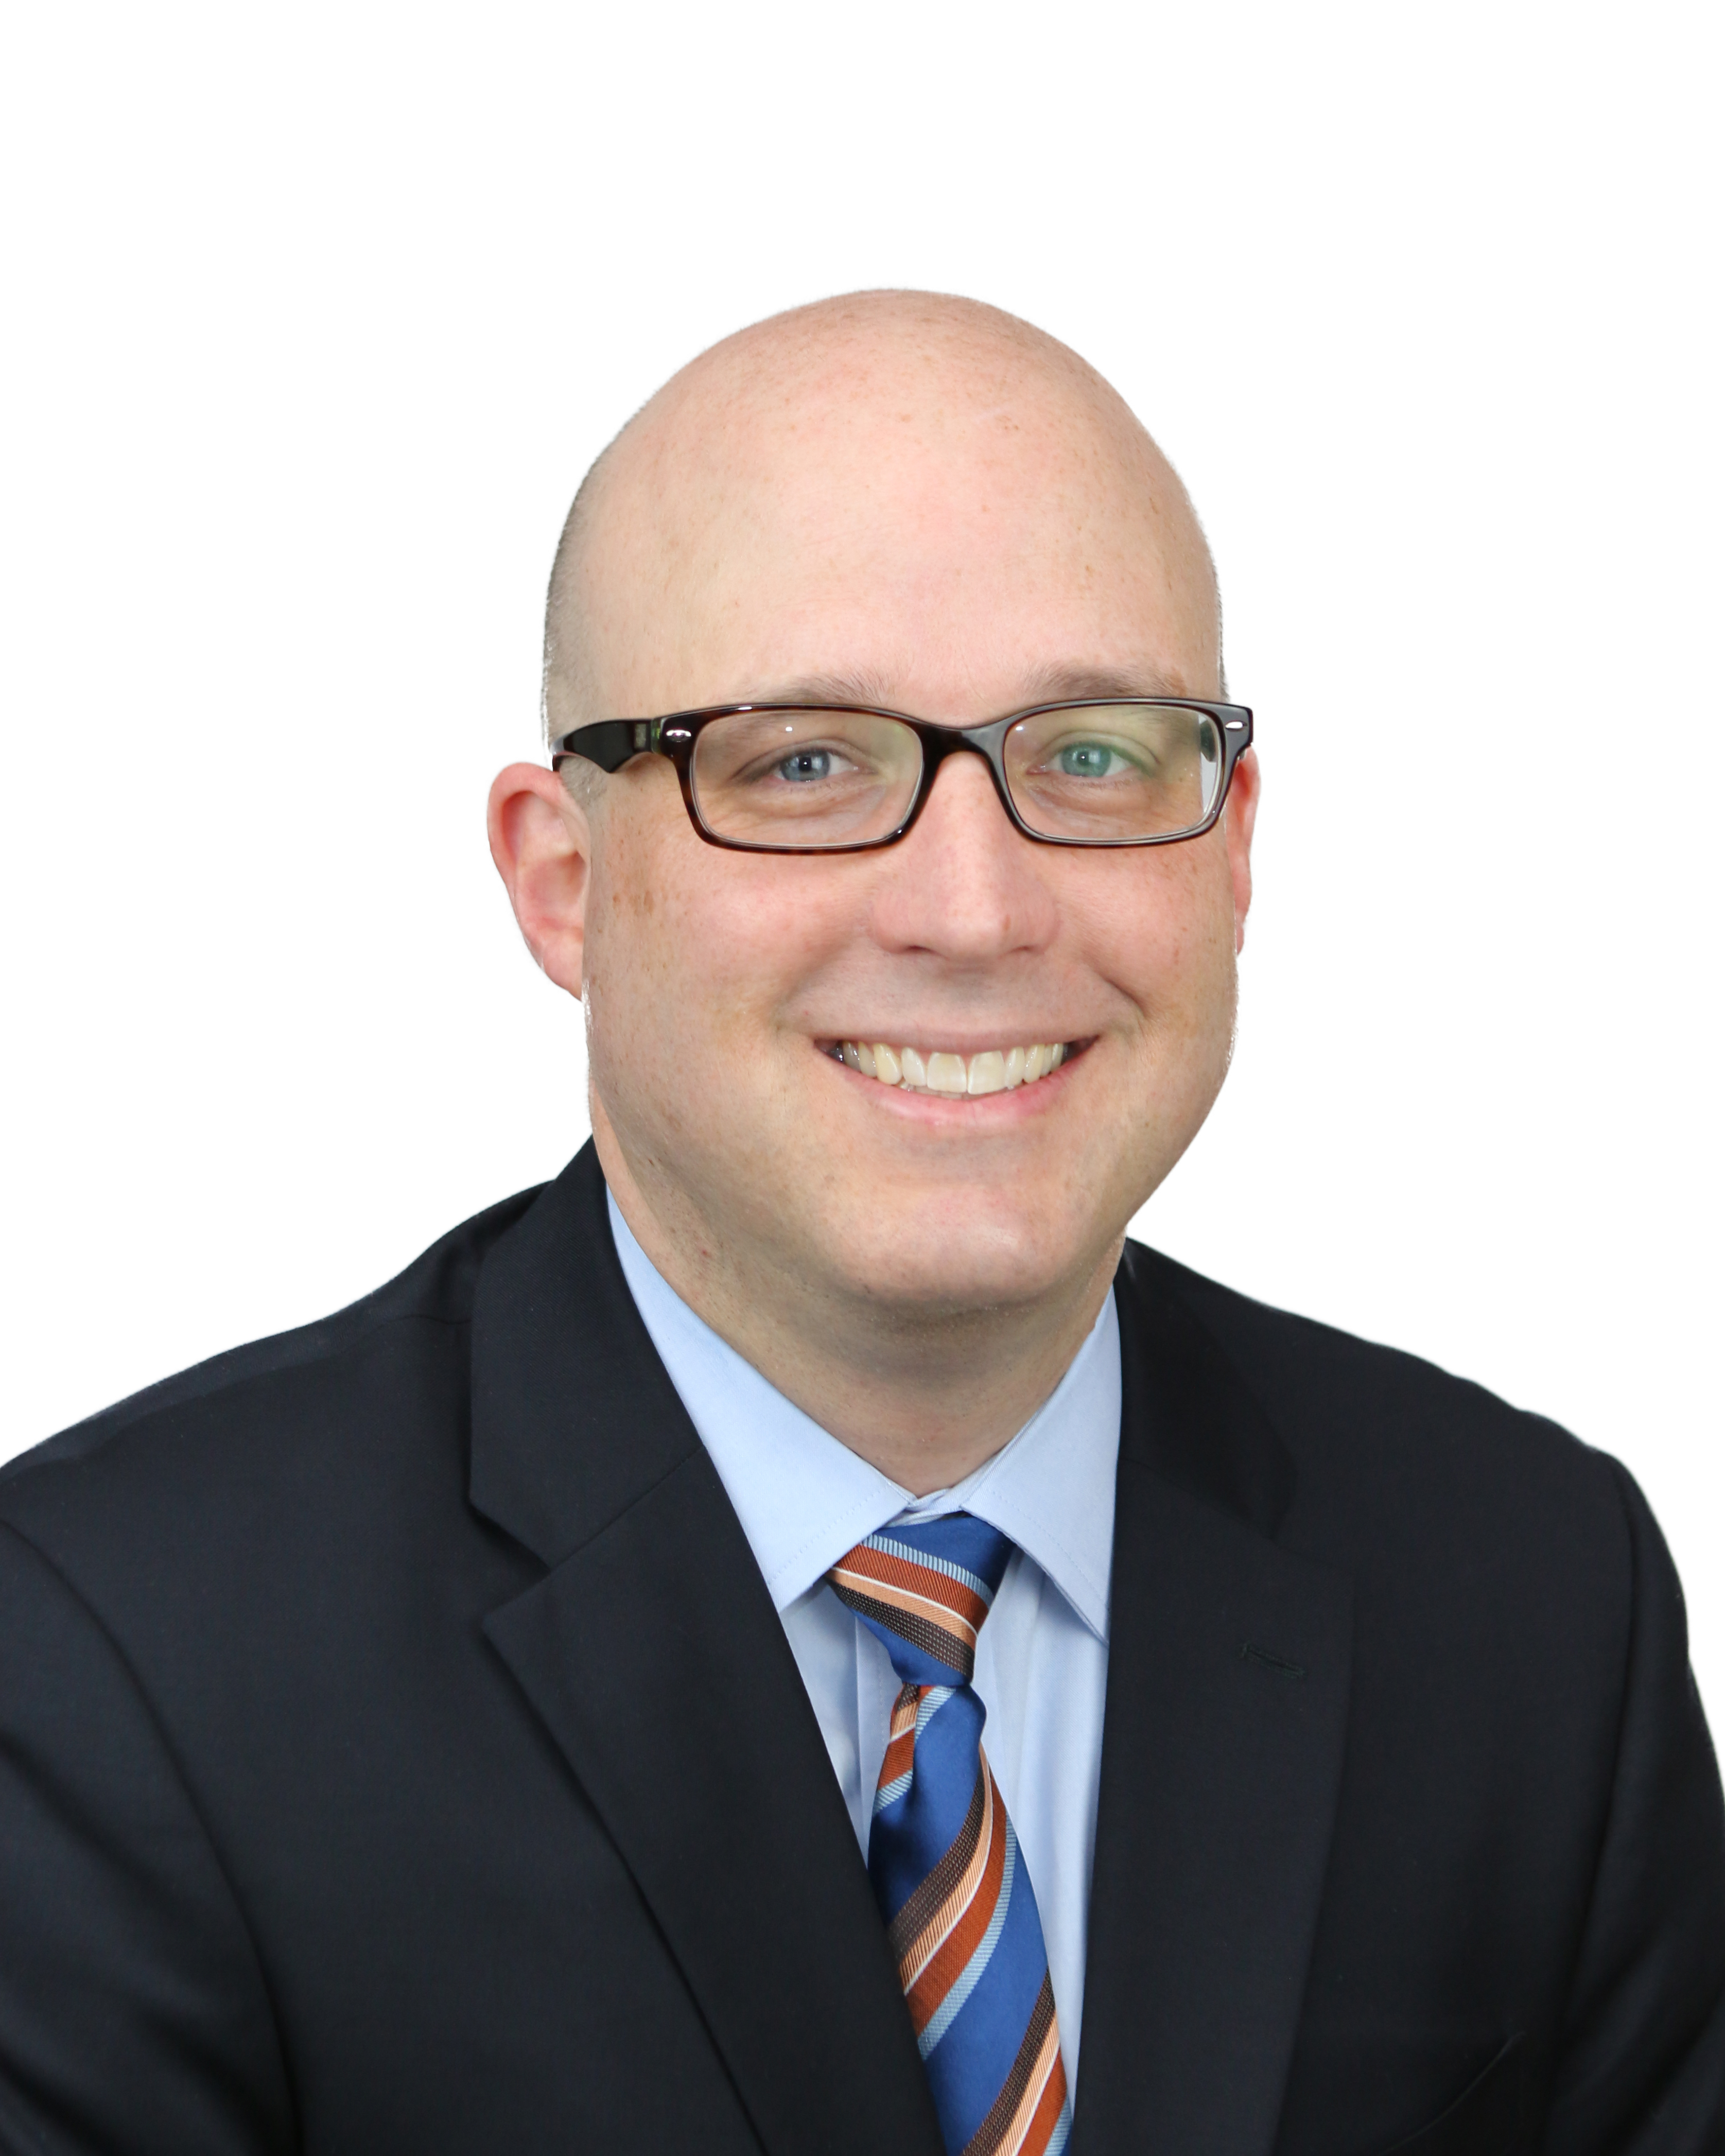 Derek Bonifer | Portfolio Manager